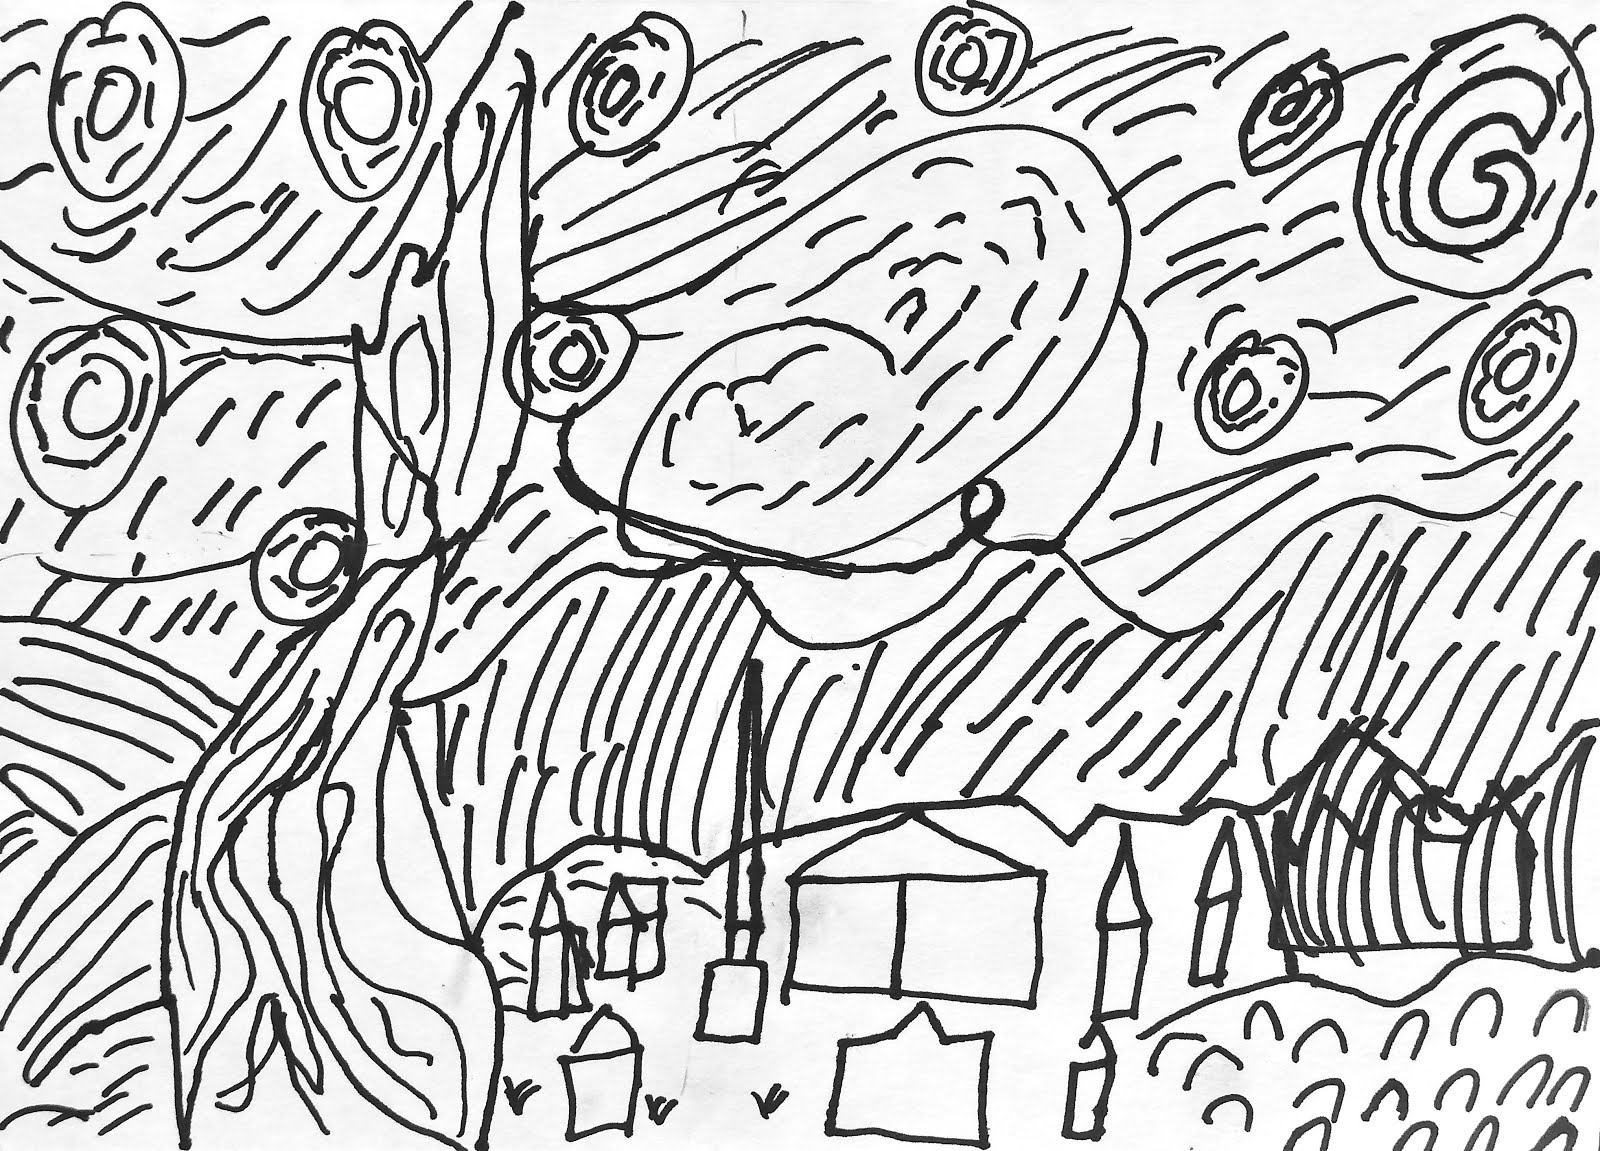 Van Gogh Drawing at GetDrawings.com | Free for personal use Van Gogh ...